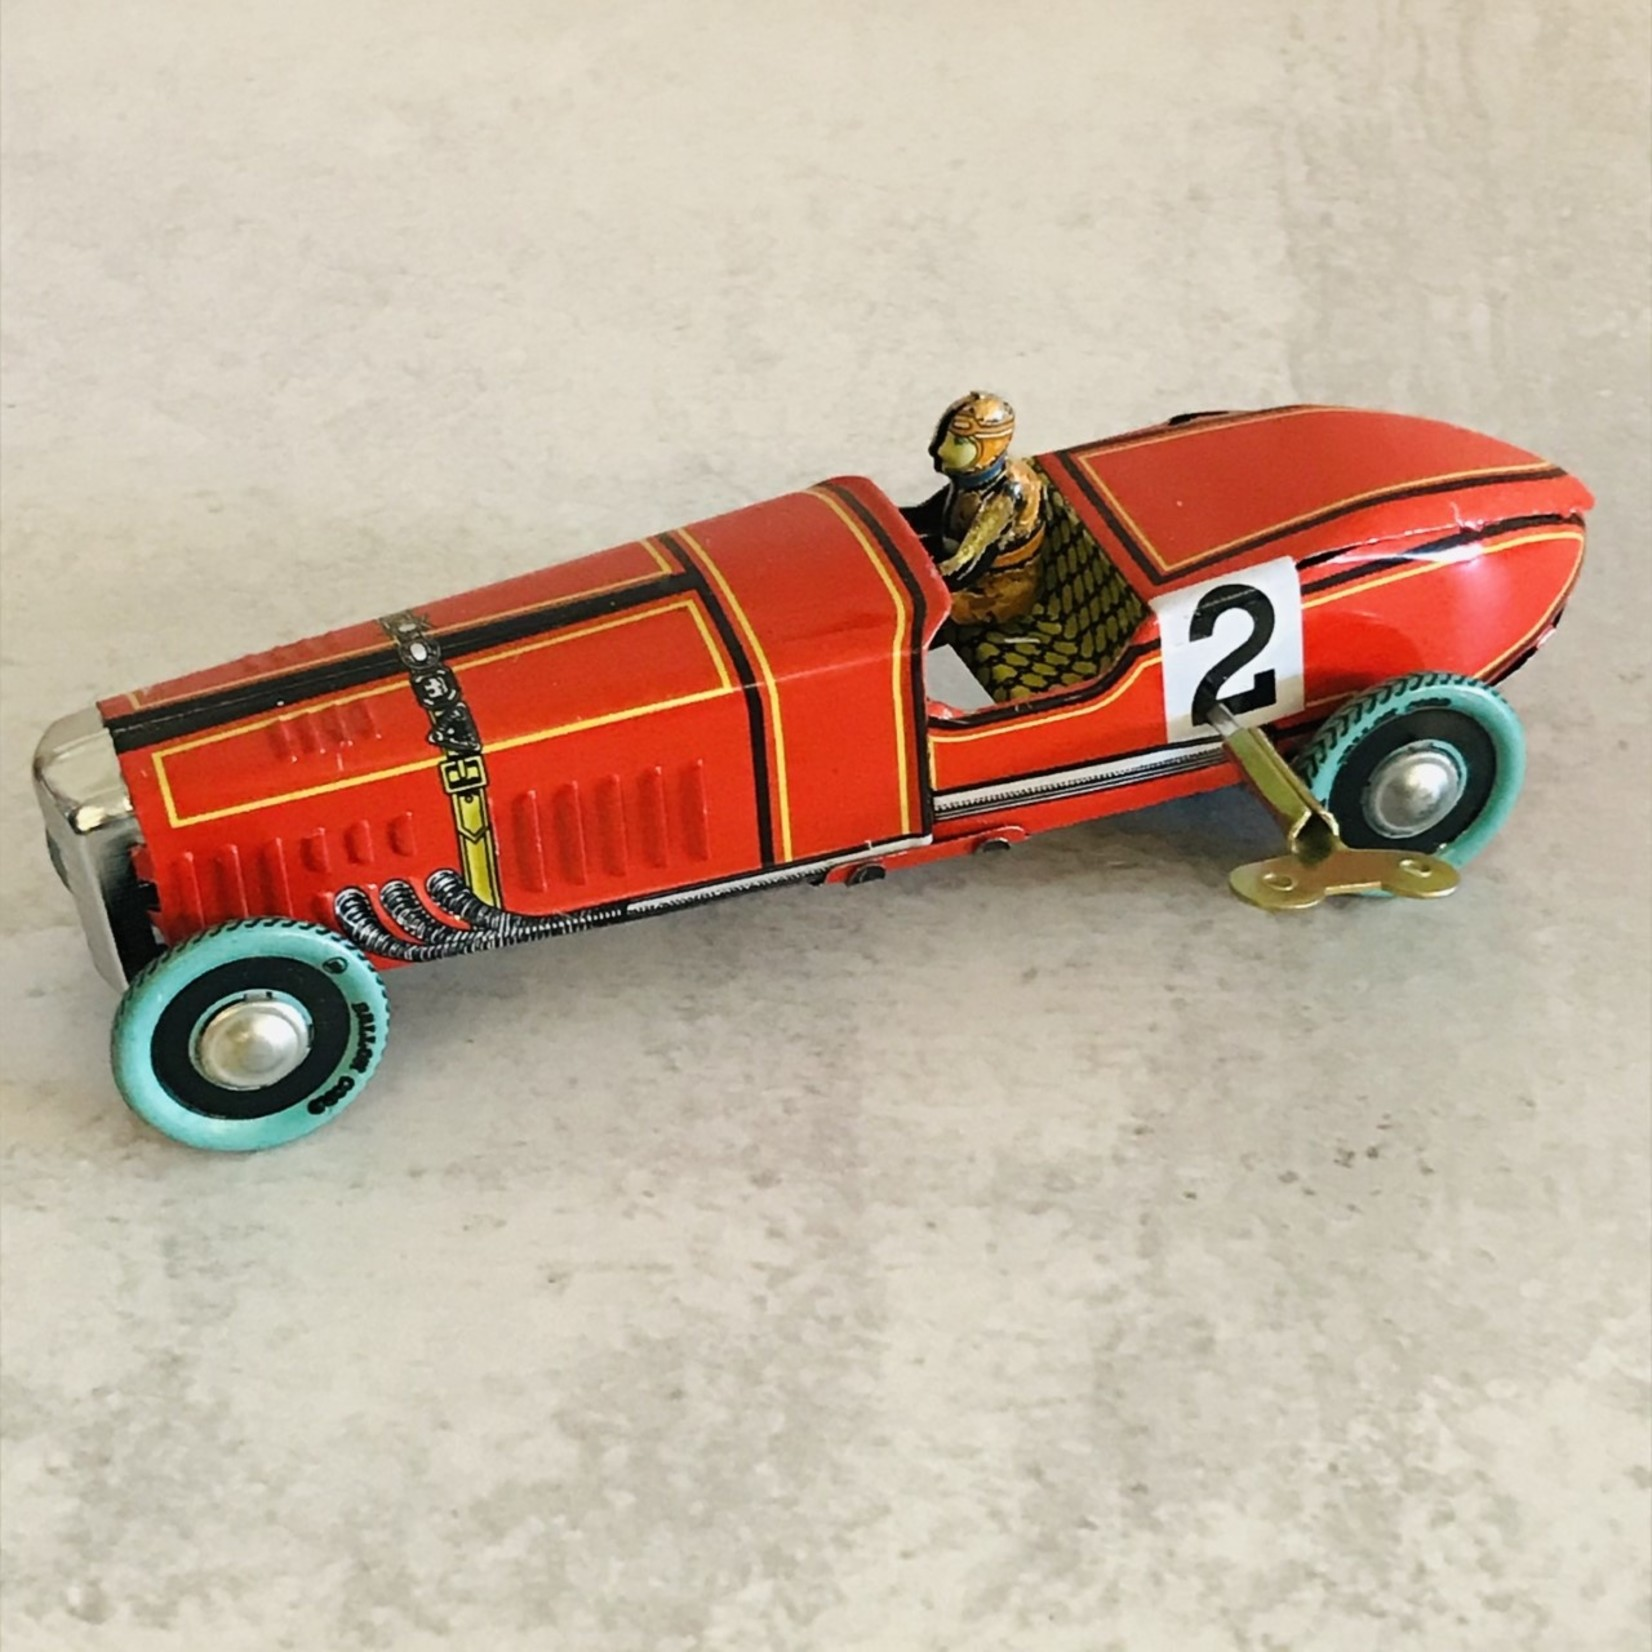 Blechfabrik Blechfabrik Racing Car Red